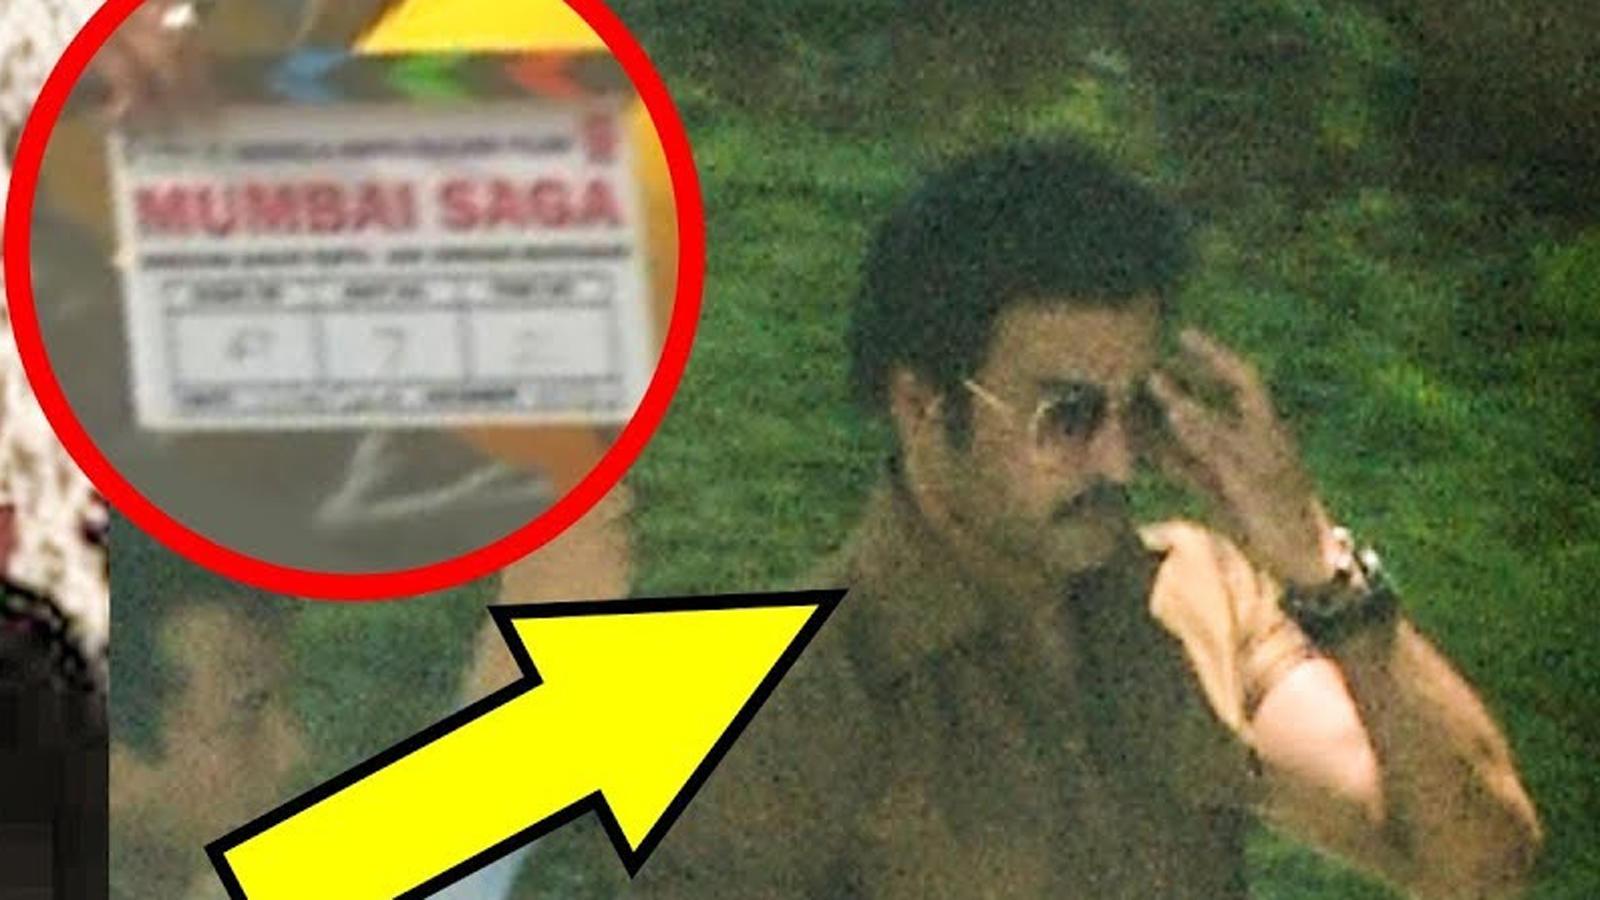 Leaked! John Abraham's first look as villain from 'Mumbai Saga'